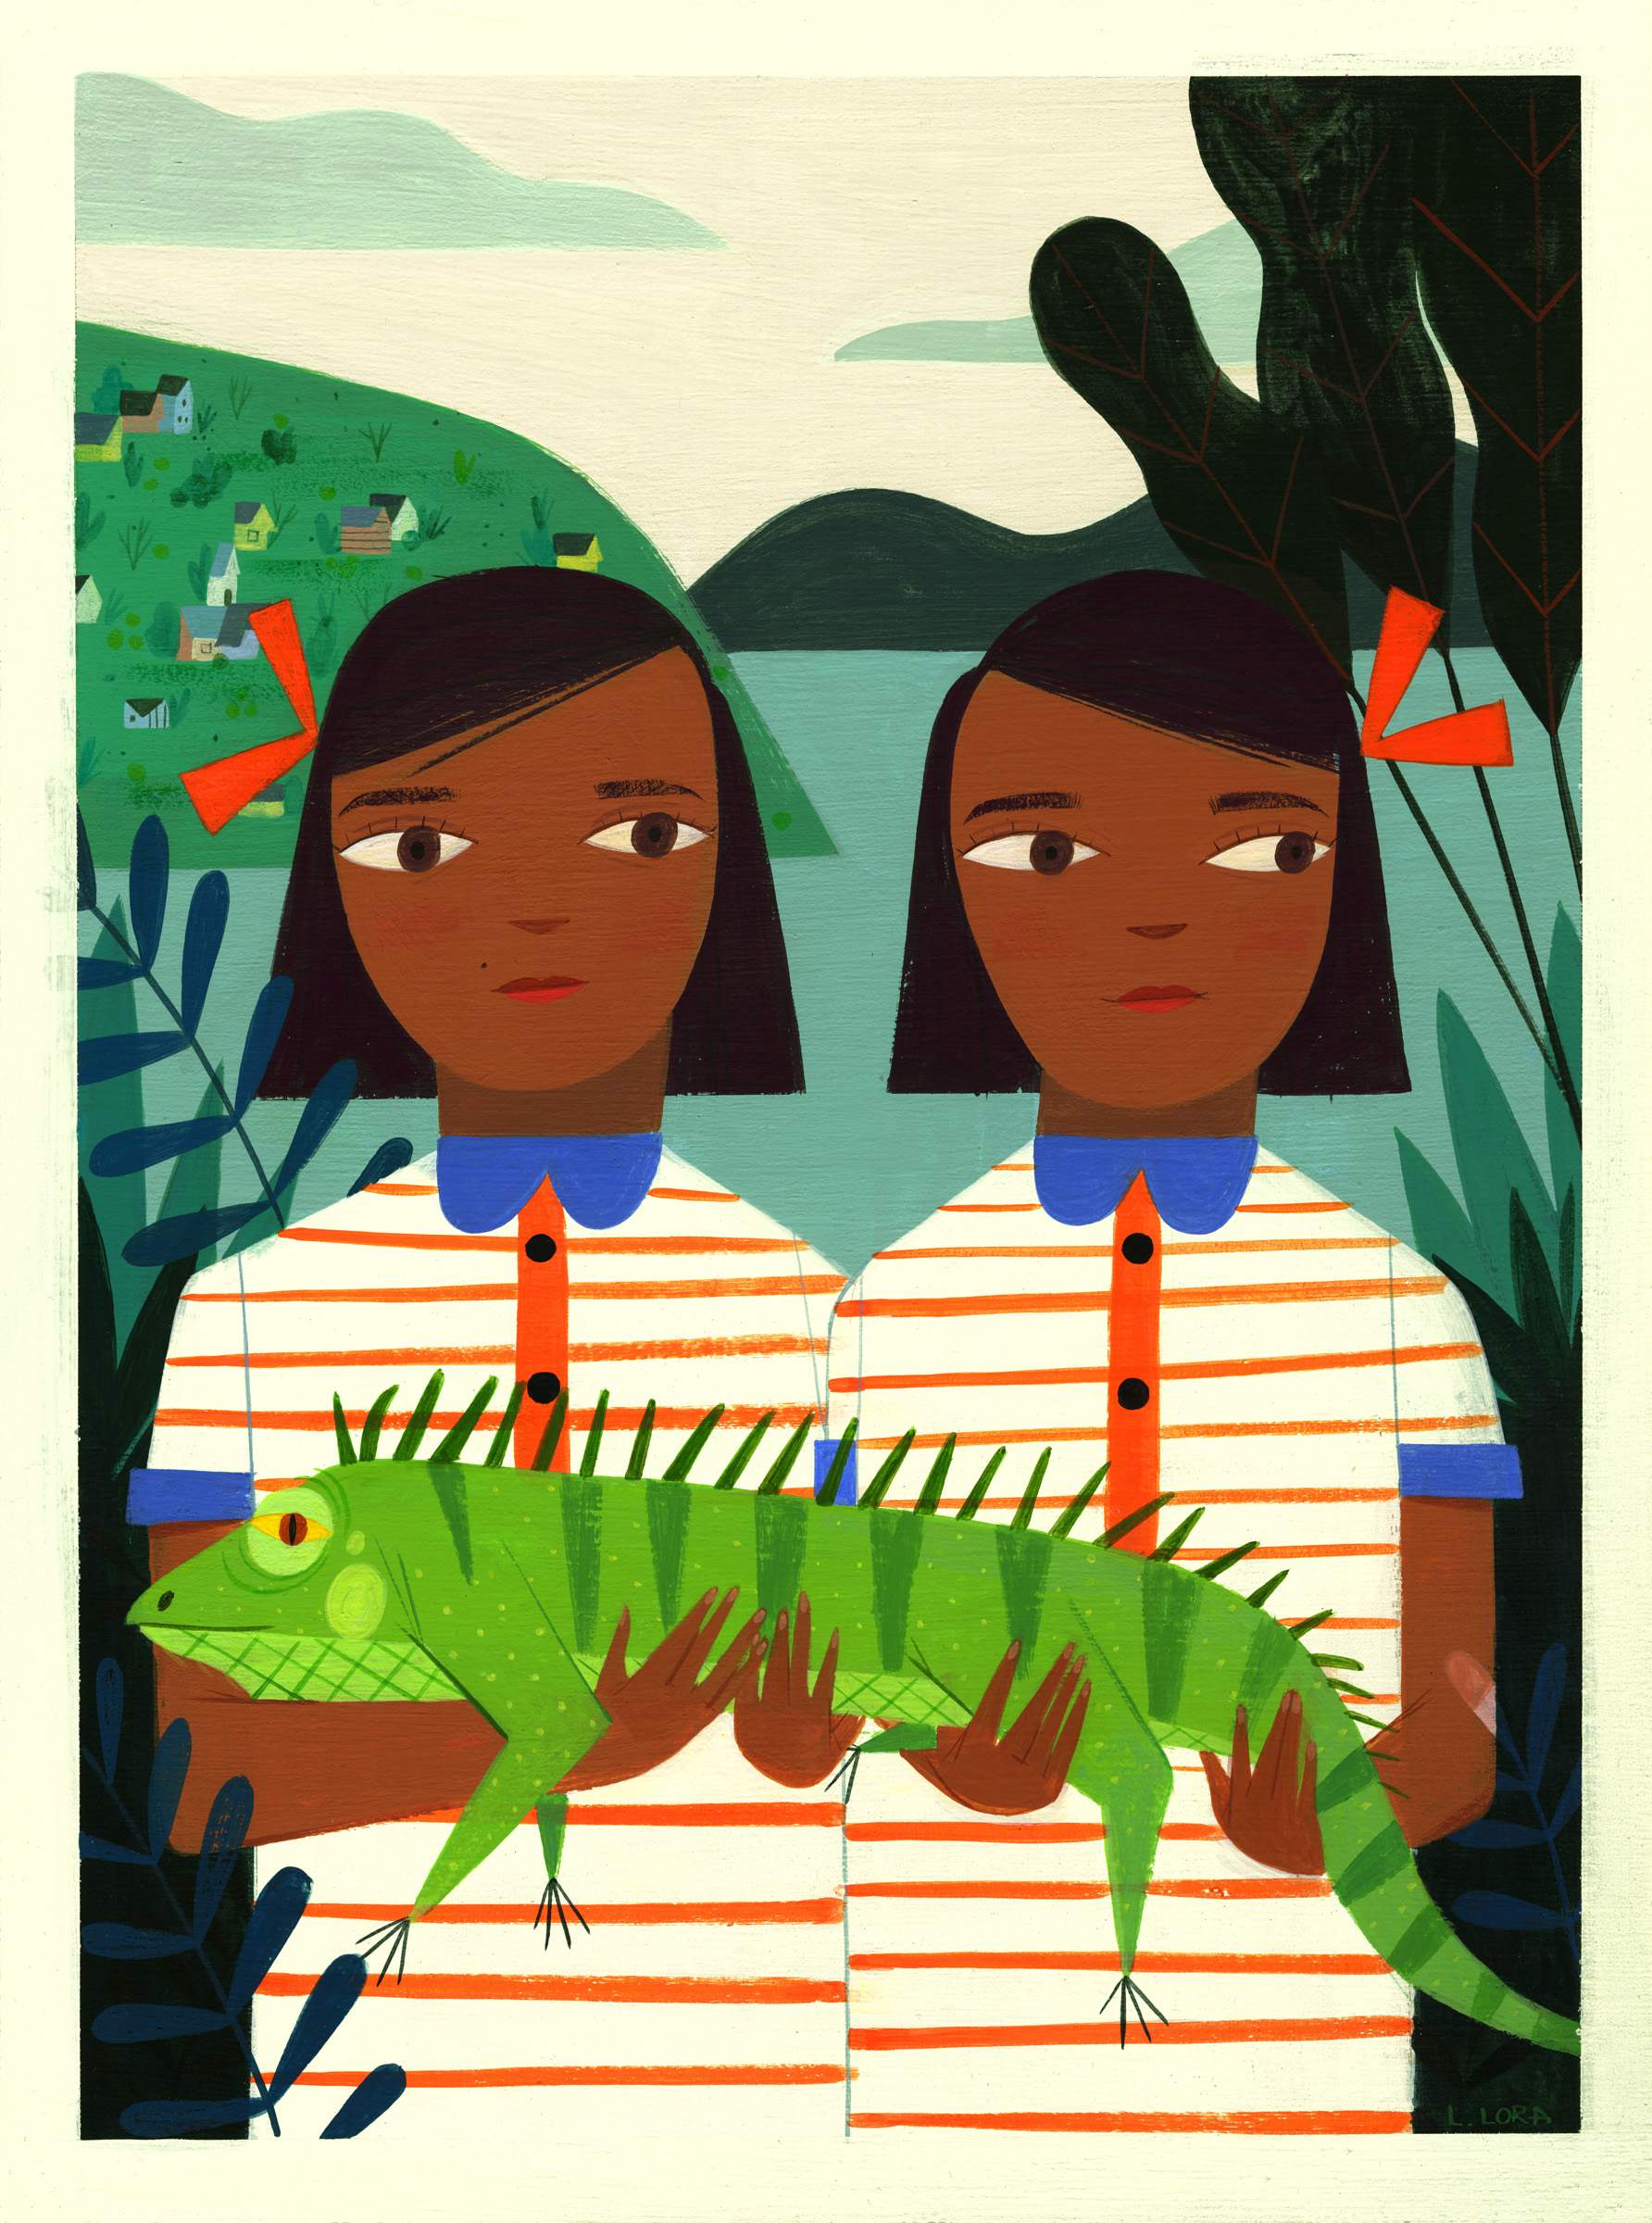 isladelas-iguanas-by-loris-lora.jpeg